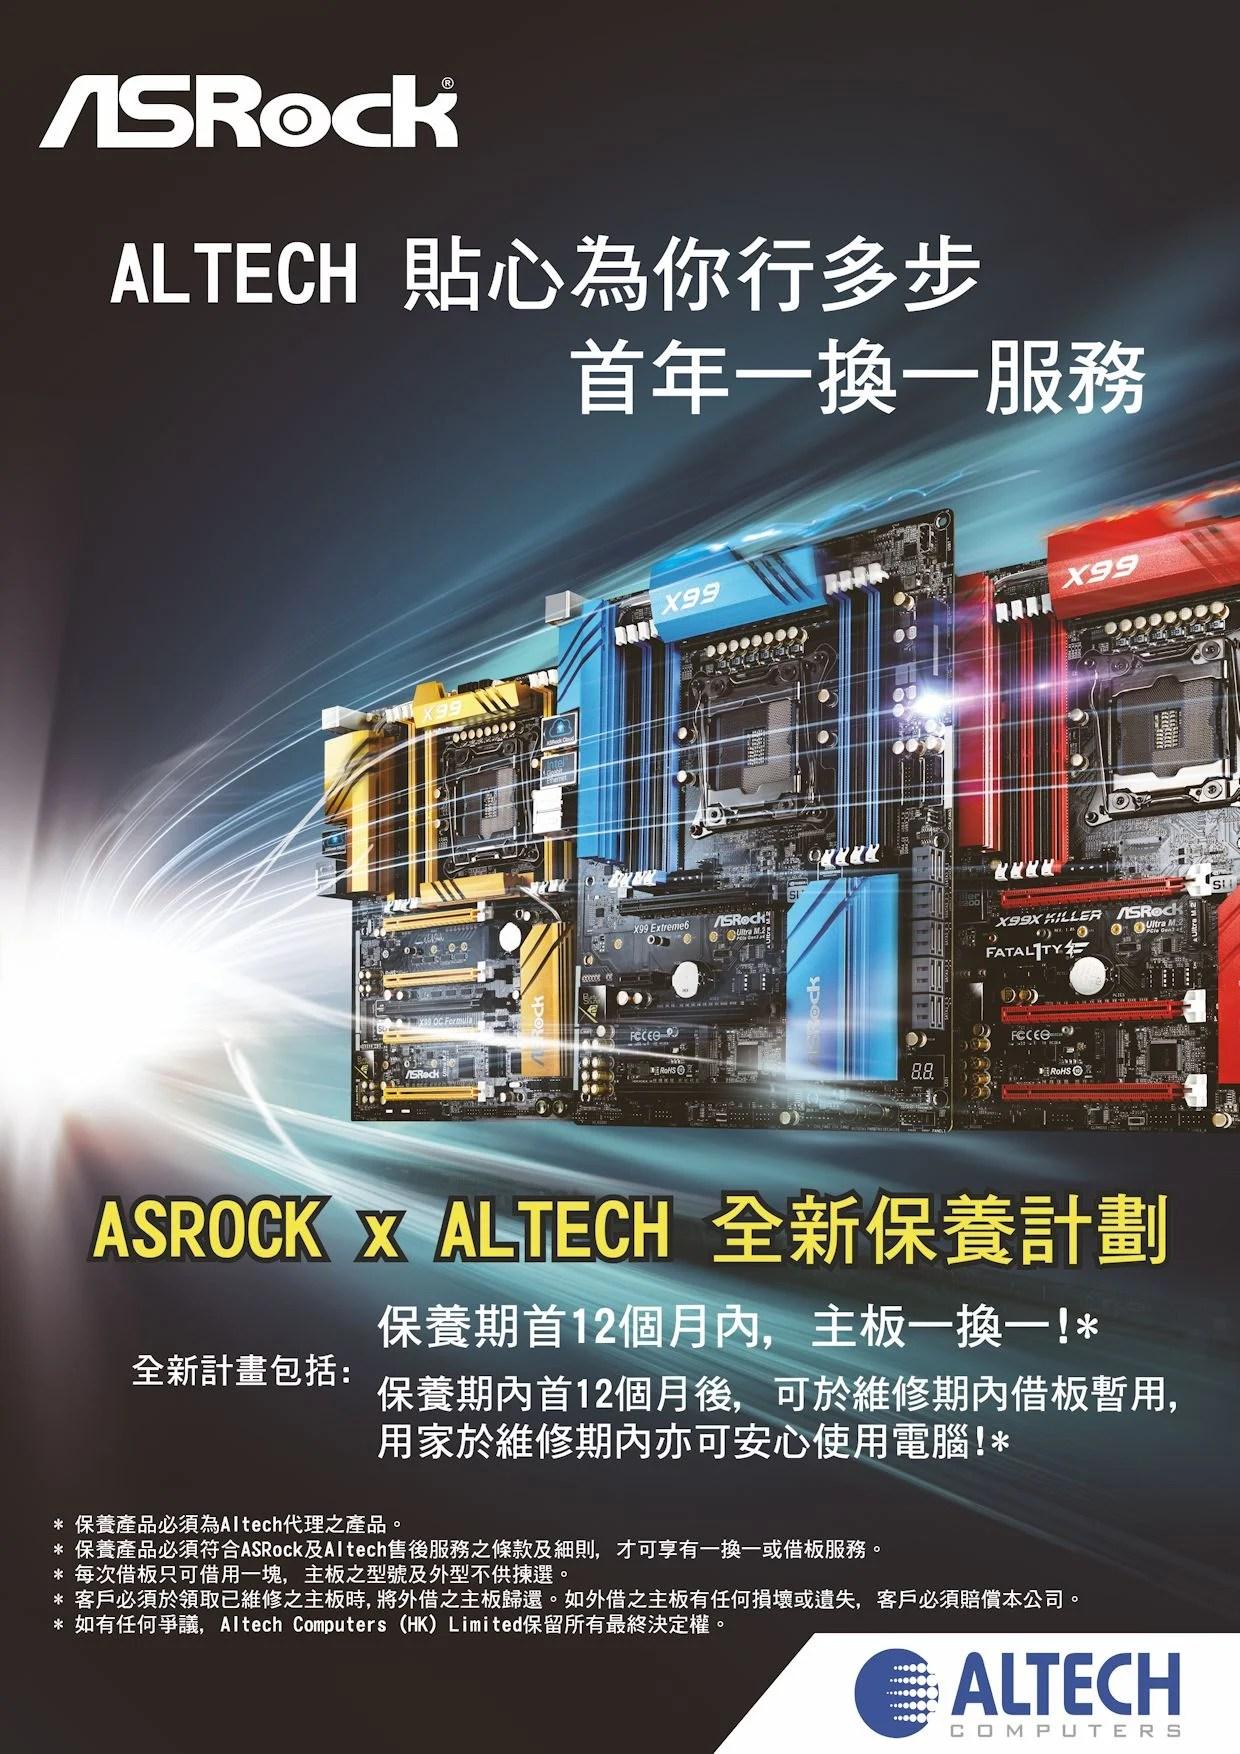 Altech 貼心為你行多步 首年 ASRock 底板提供一換一服務 - 電腦領域 HKEPC Hardware - 全港 No.1 PC網站